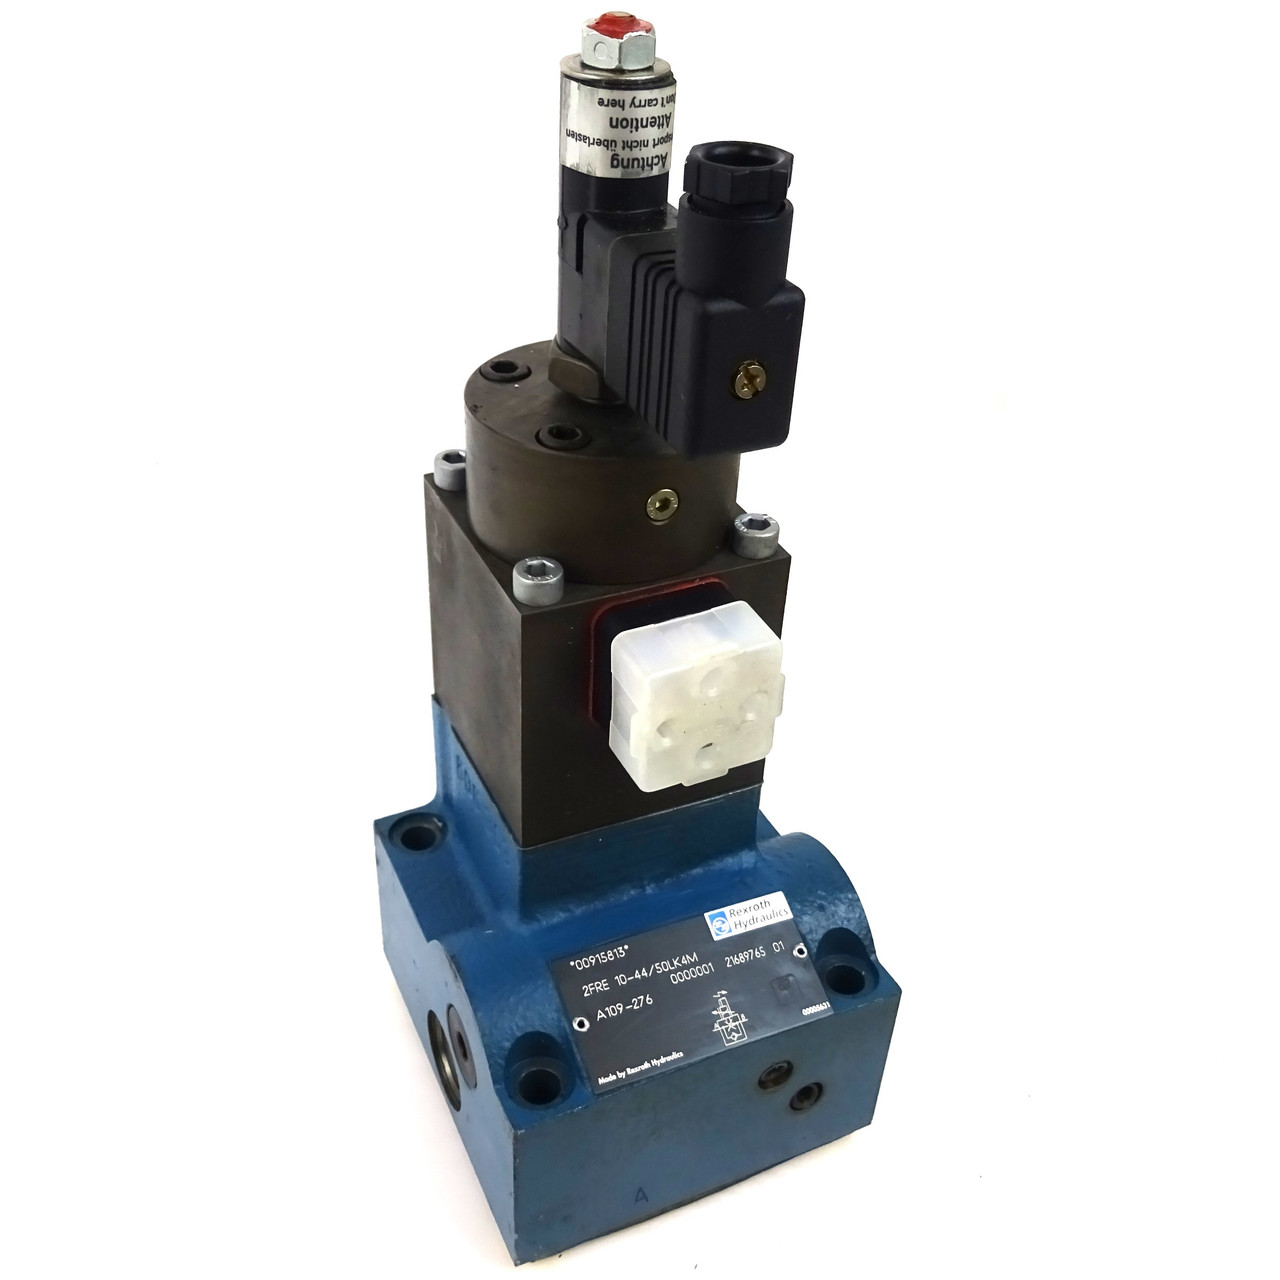 Rexroth Hydraulic valves / rexroth pneumatic valves